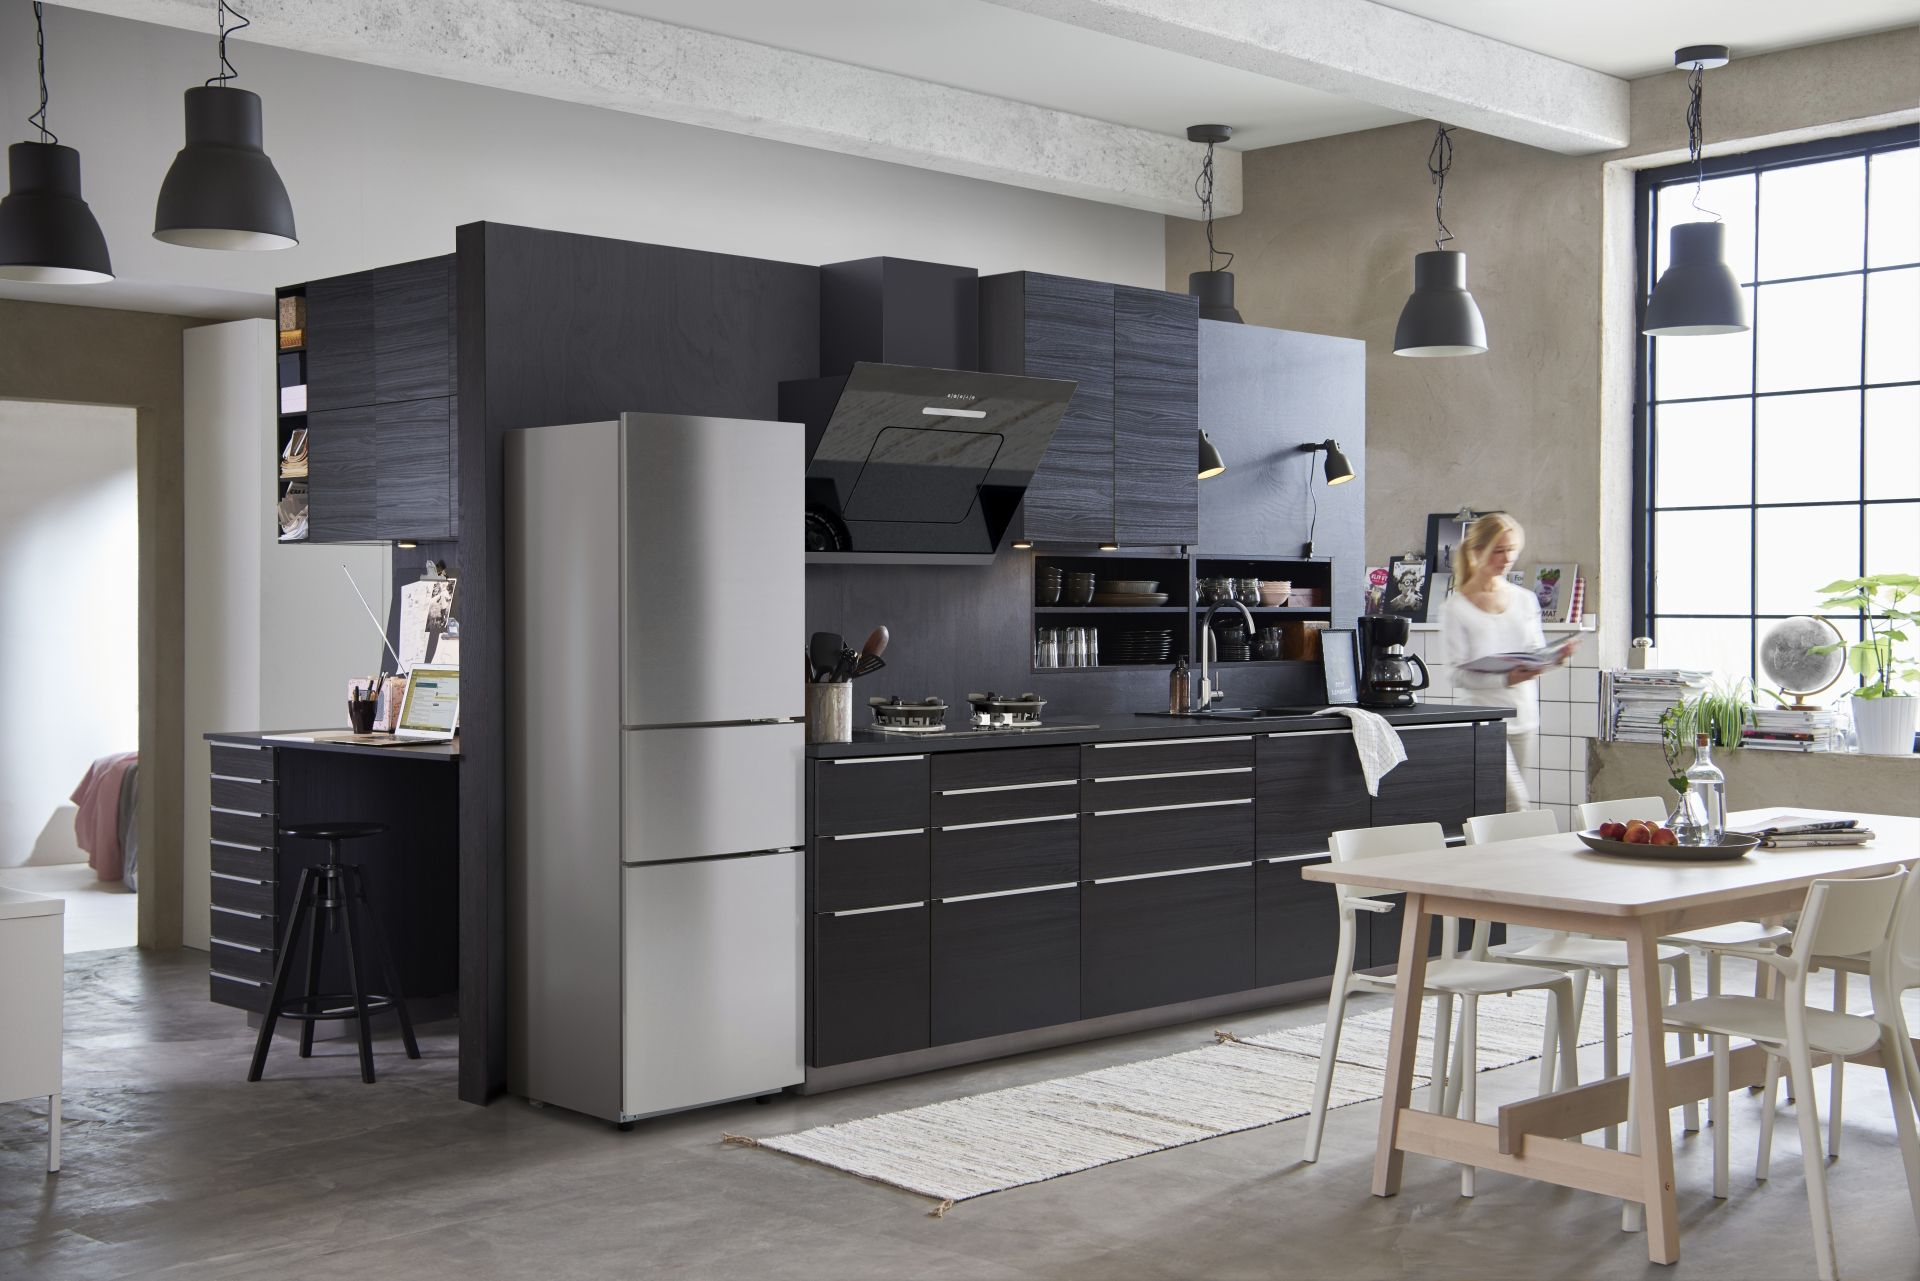 Onderkast Keuken Ikea : Keller keukens onderkasten losse keukenlade nolte bestekbak voor